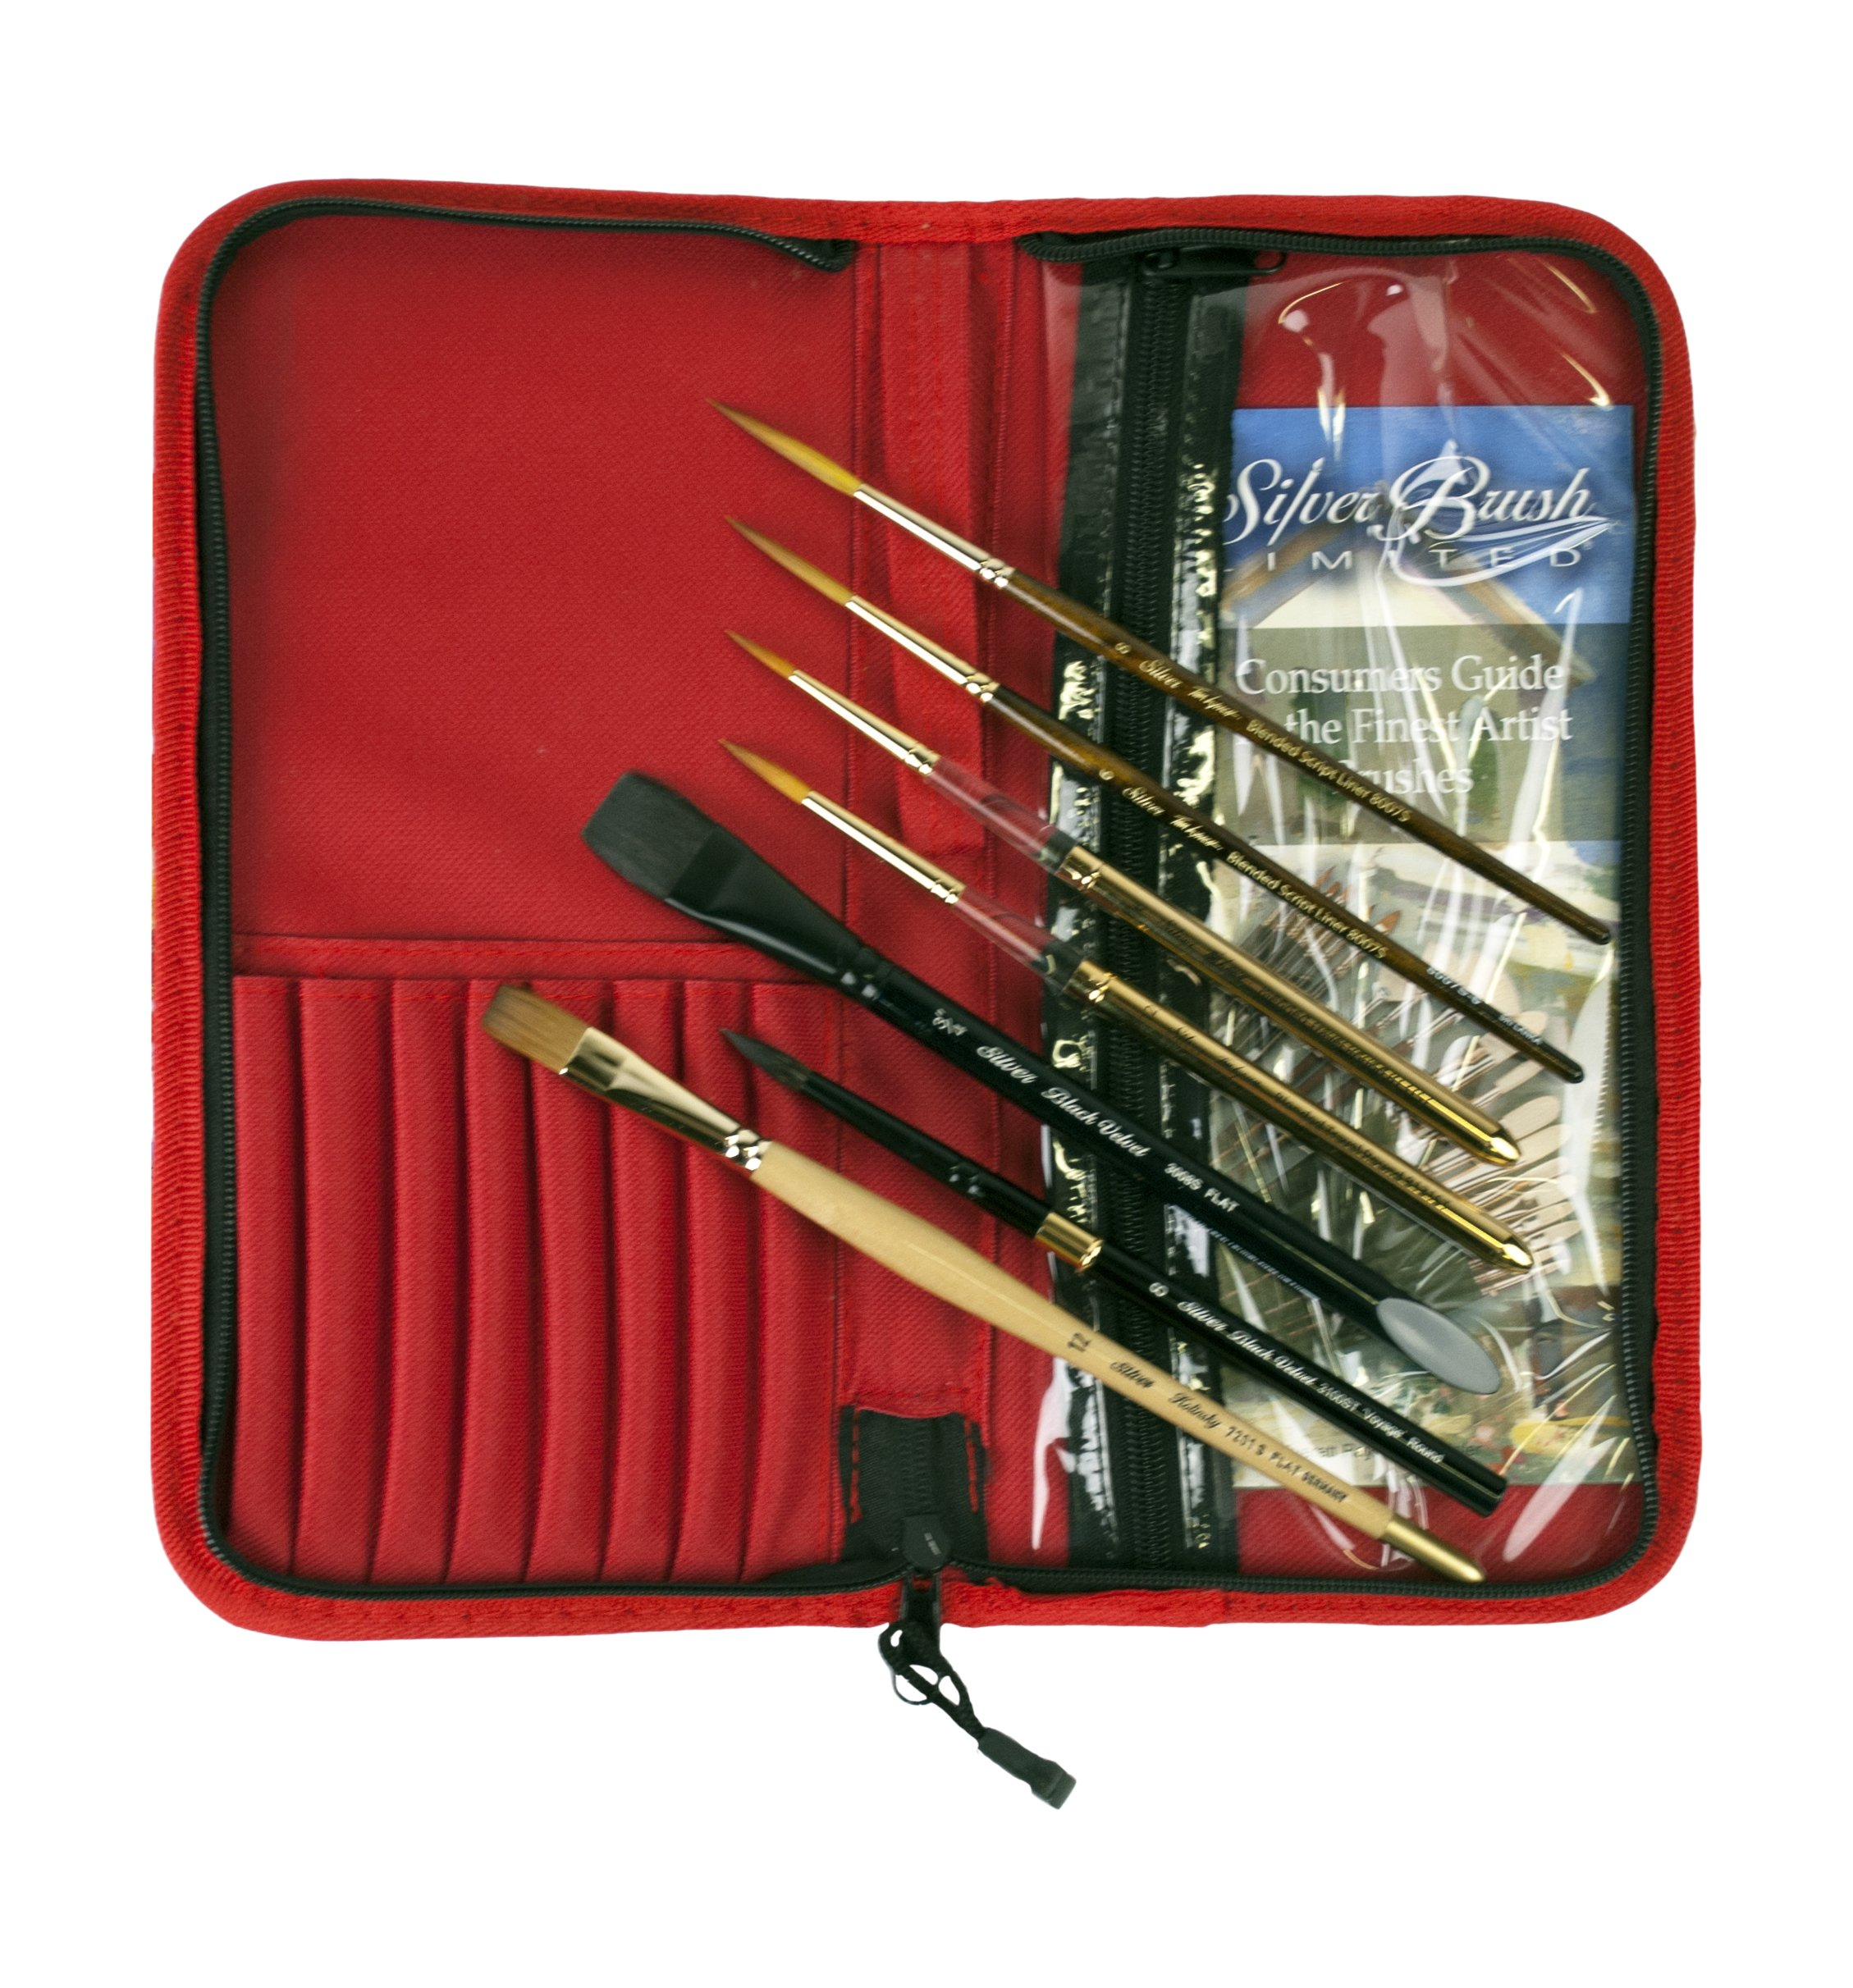 Silver Brush Tom Lynch Plein Air Travel 8 Piece Brush Set